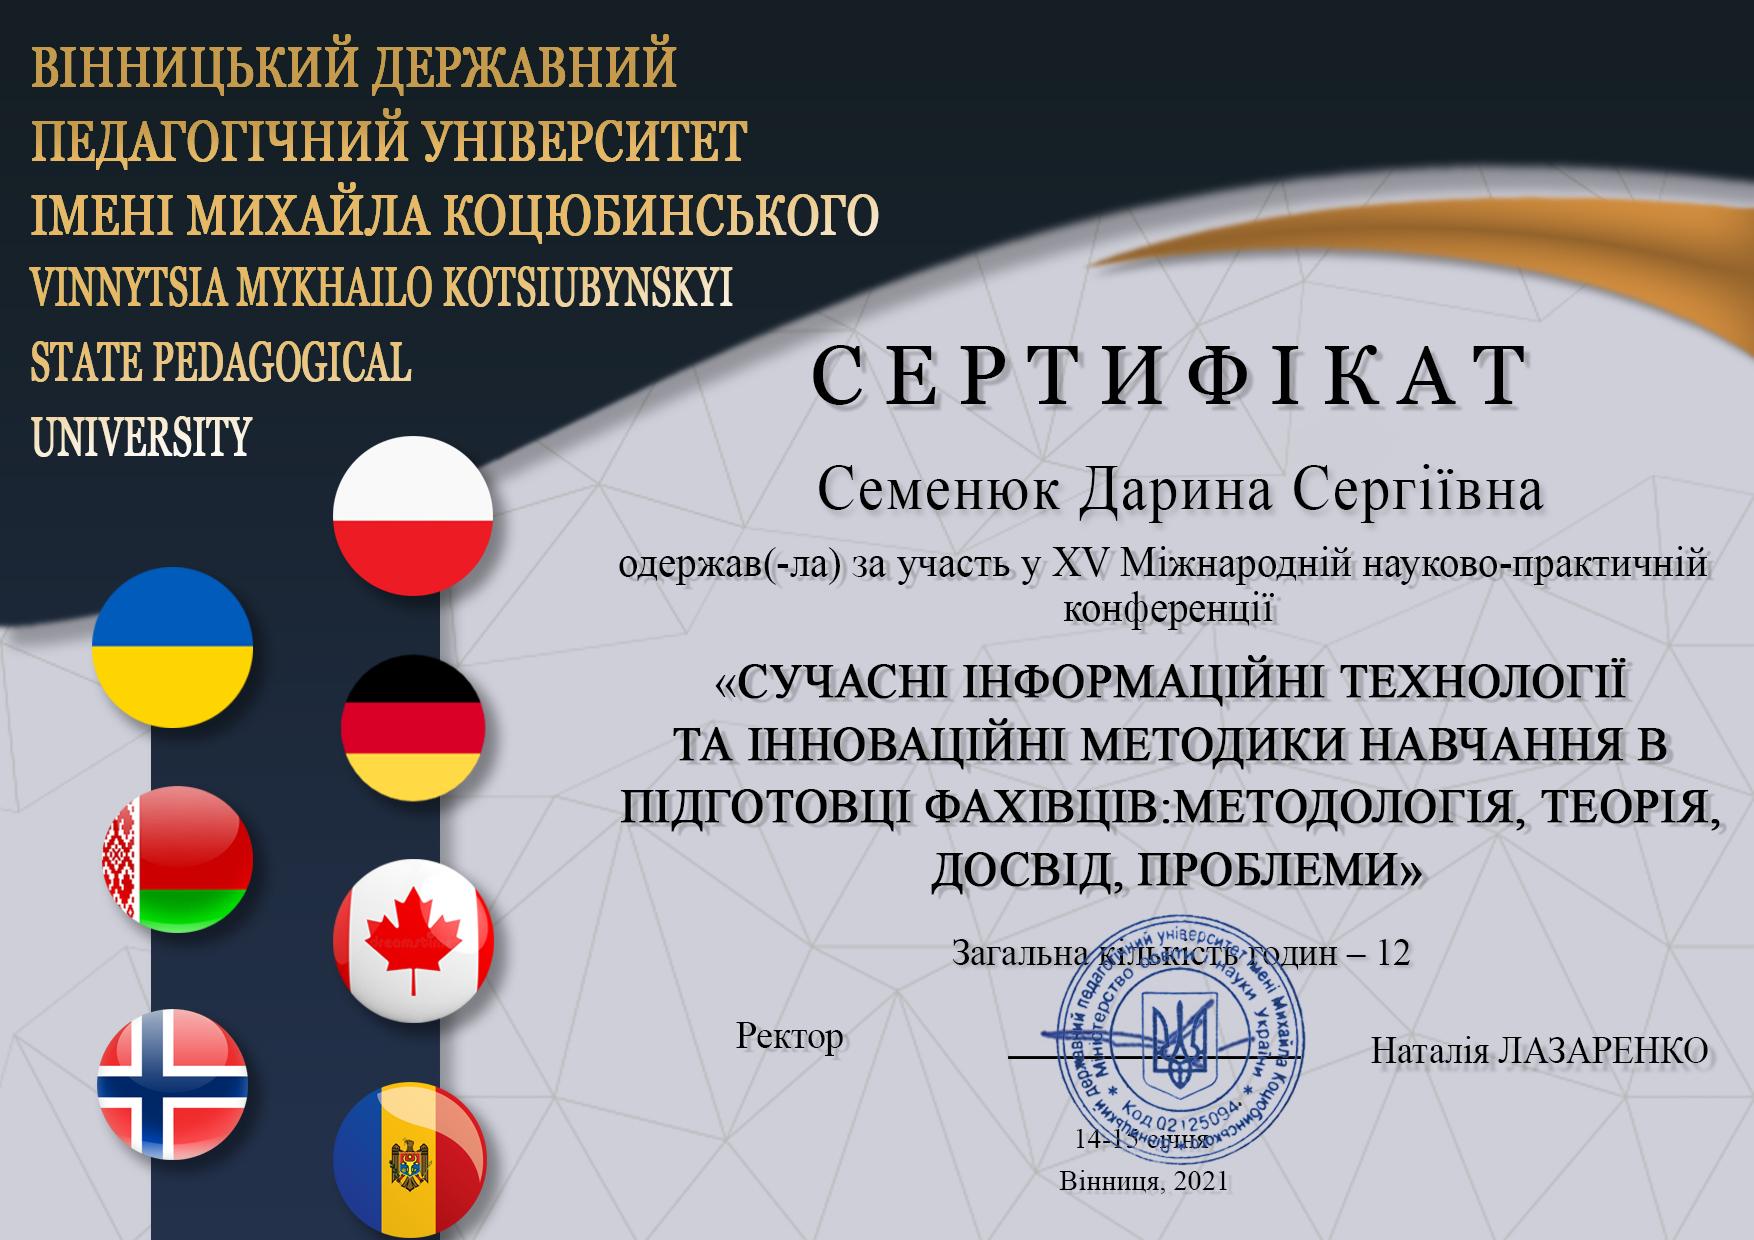 Семенюк Дарина Сергіївна